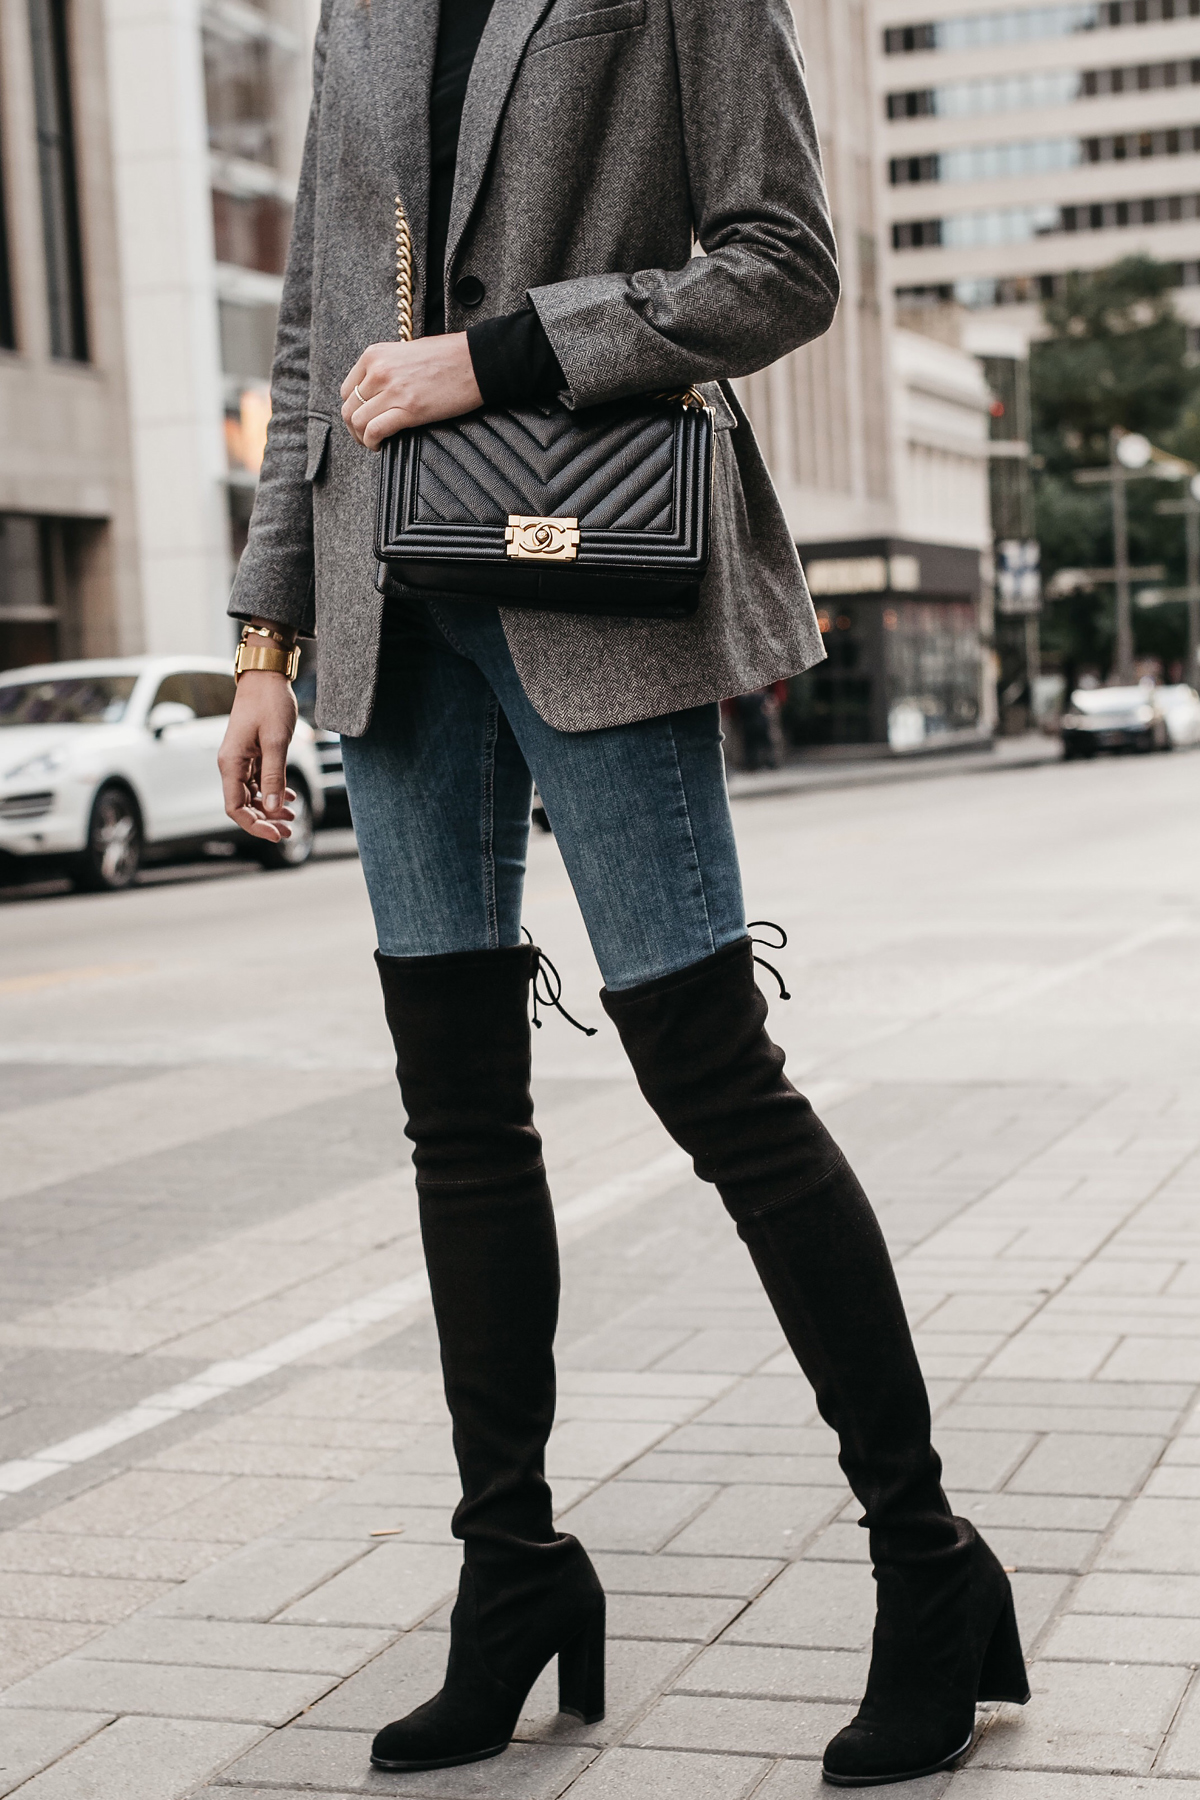 Stuart Weitzman Over the Knee Black Boots Denim Jeans Grey Blazer Chanel Black Boy Bag Fashion Jackson Dallas Blogger Fashion Blogger Street Style